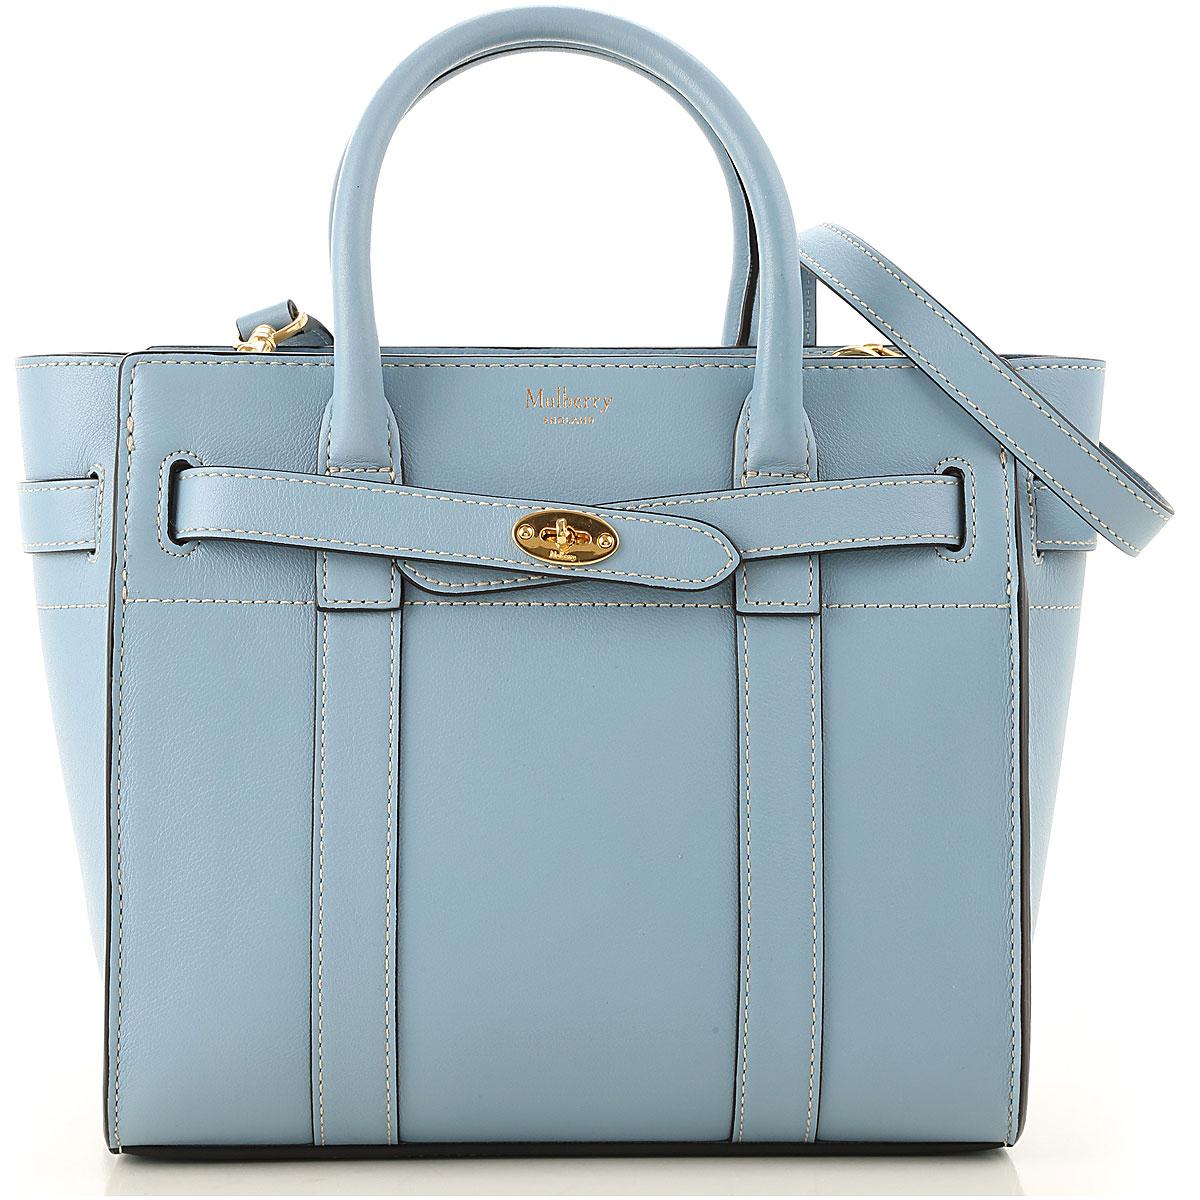 Mulberry Top Handle Handbag On Sale, Nordic Blue, Leather, 2019